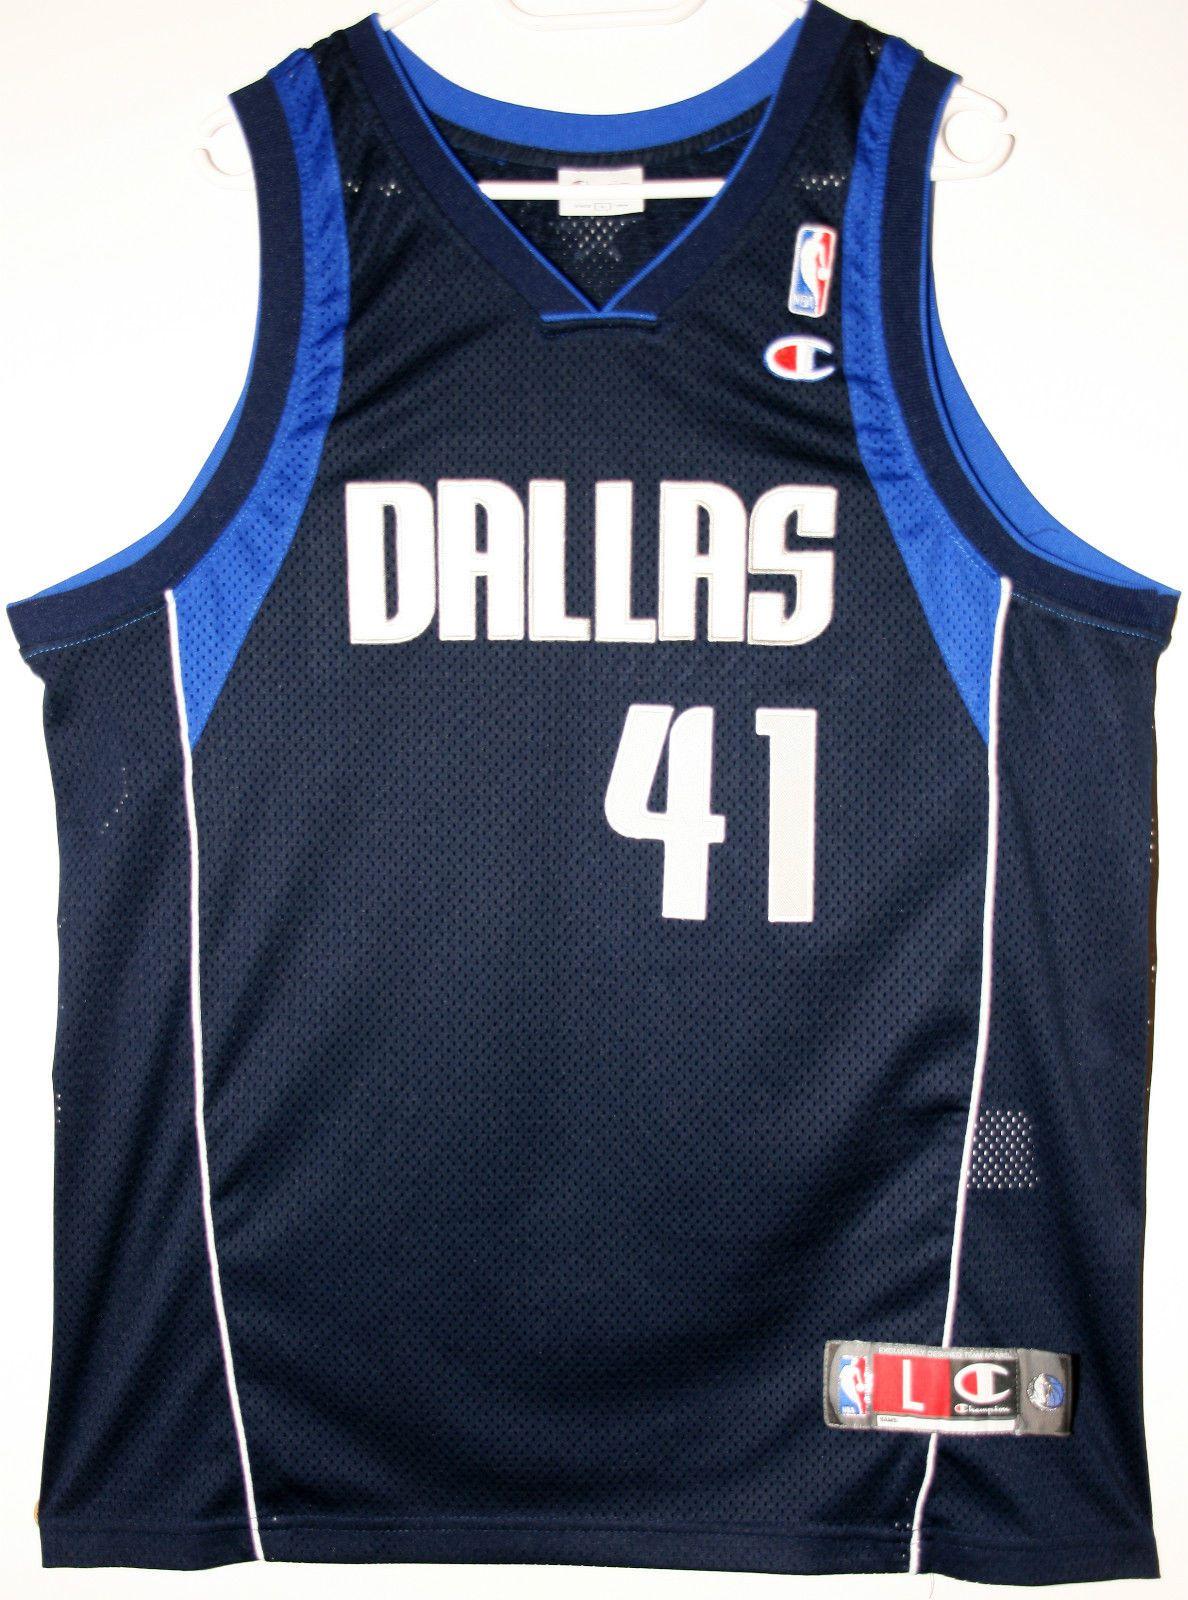 671bc7adb3e ... Champion NBA Basketball Dallas Mavericks 41 Dirk Nowitzki Authentic  Trikot Jersey Size L ...